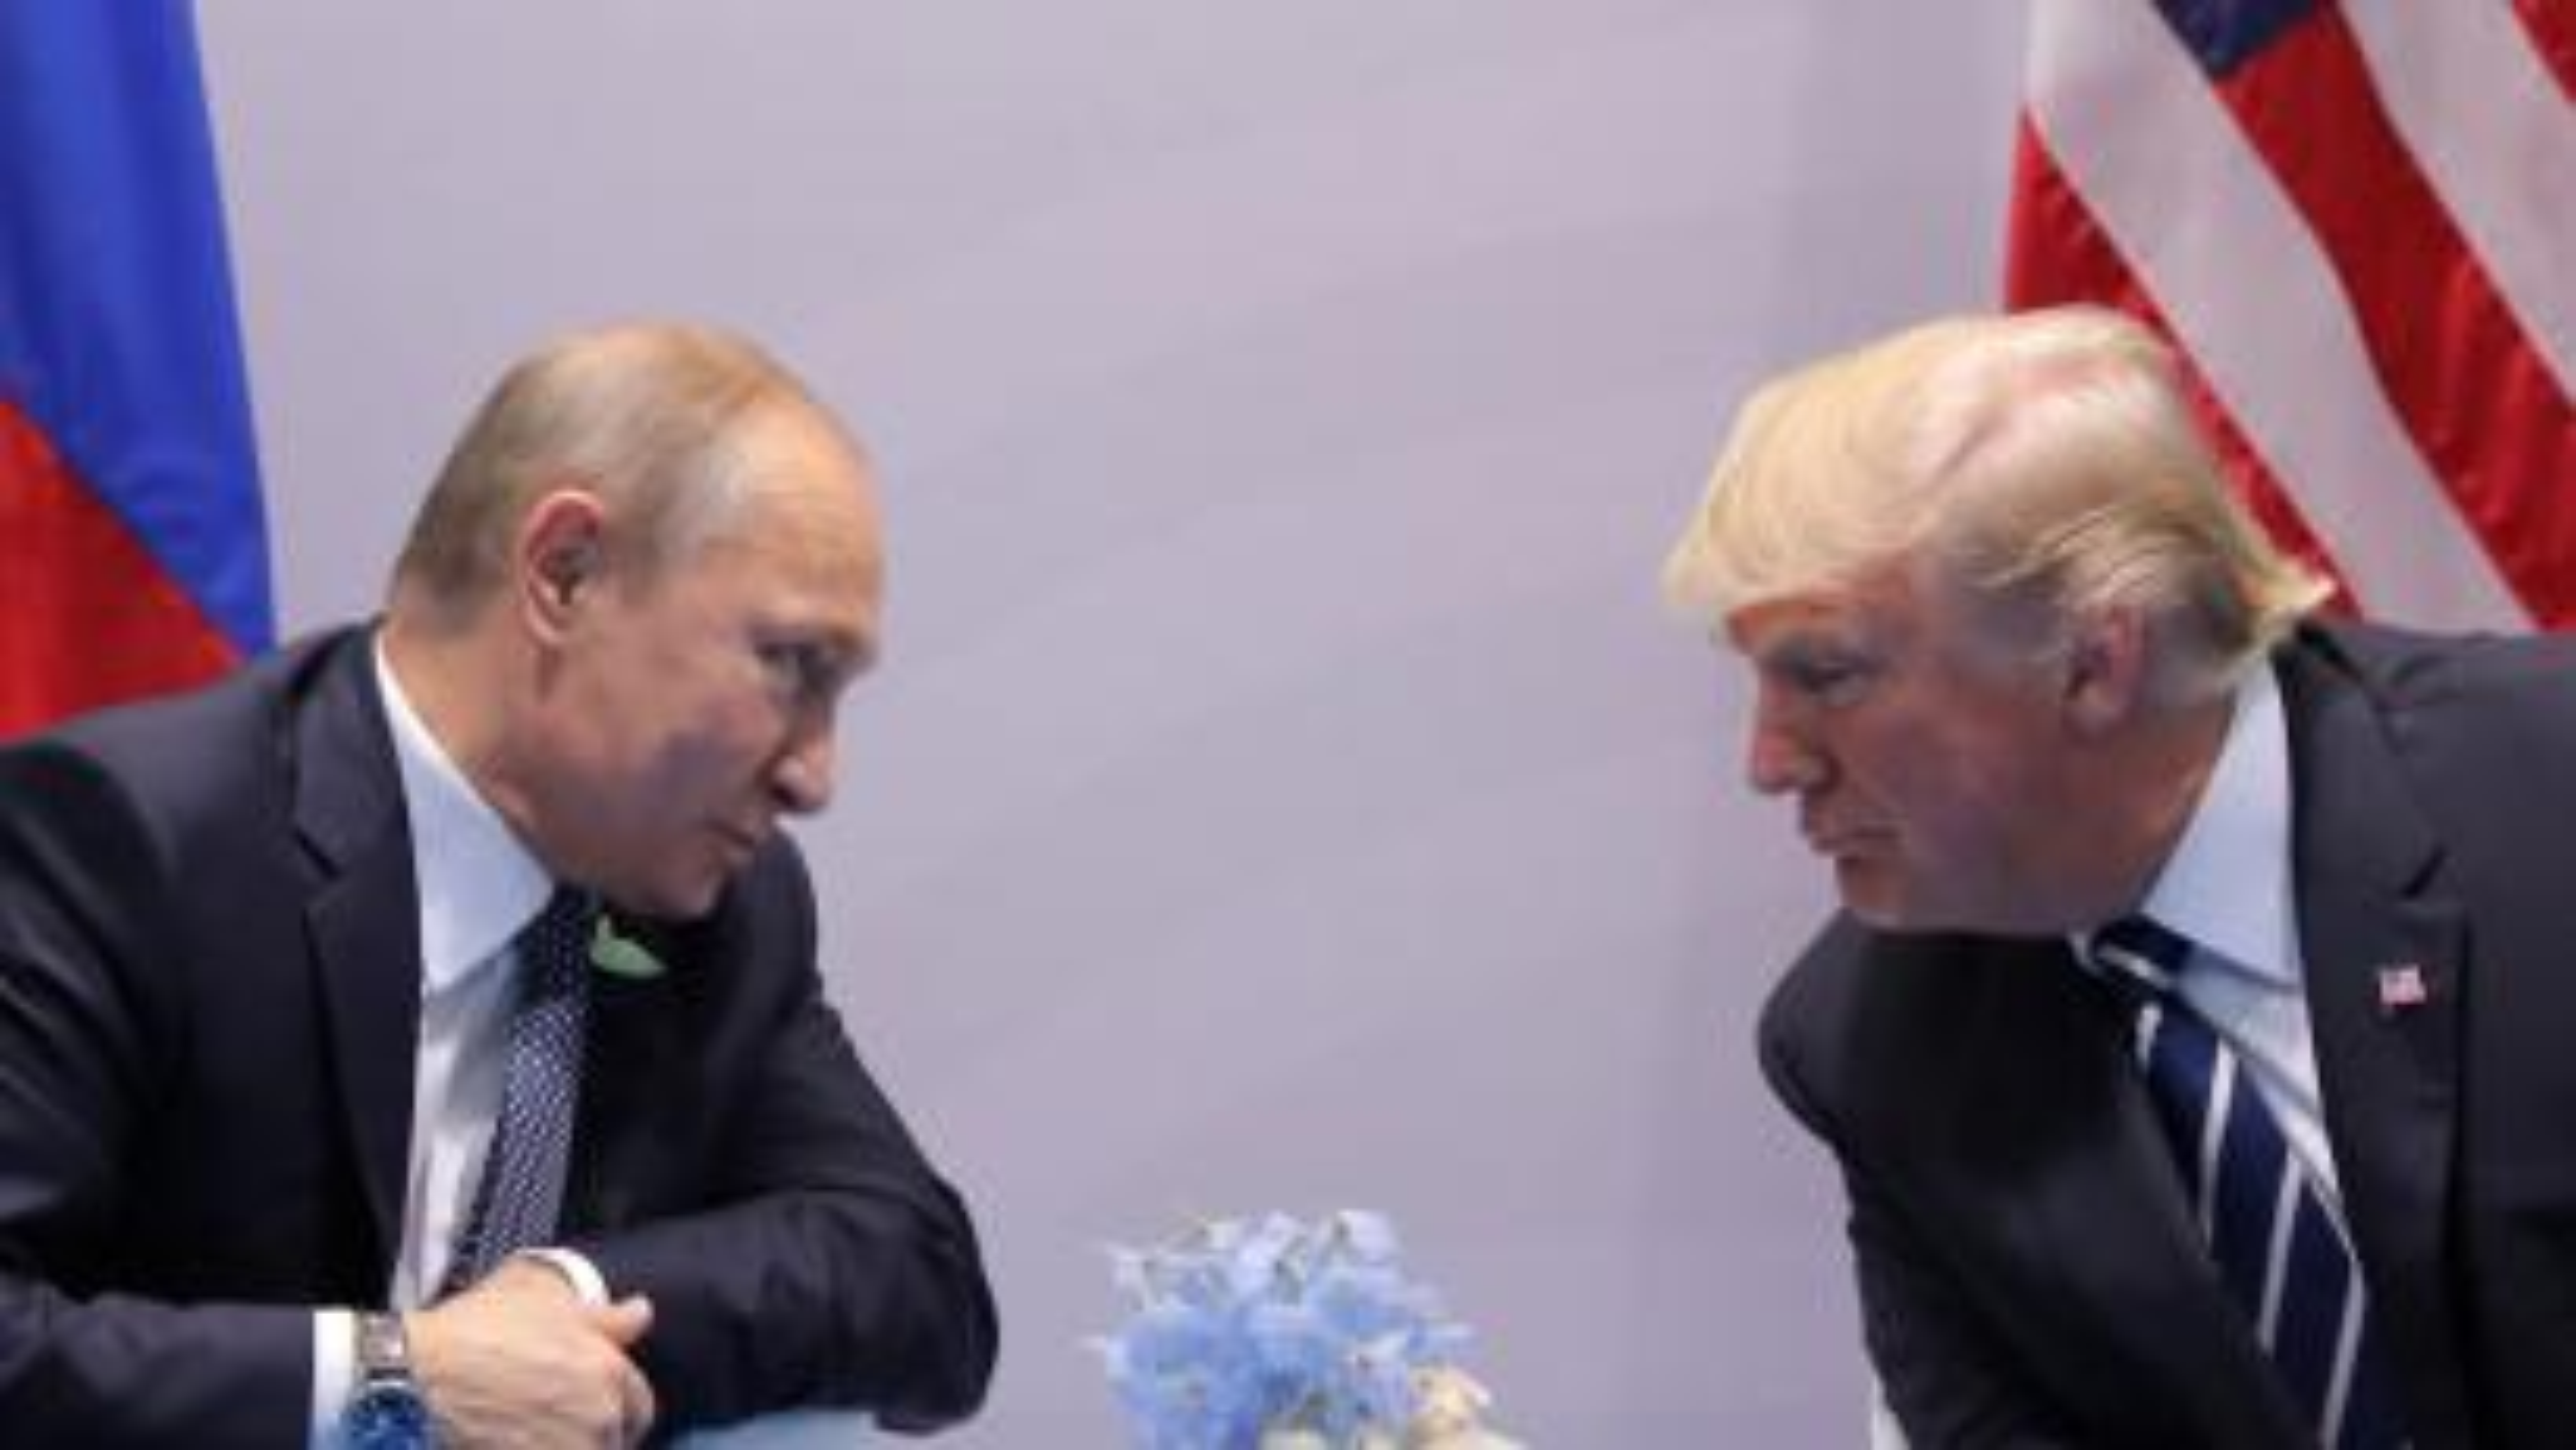 Putin and Trump in Hamburg in 2017.